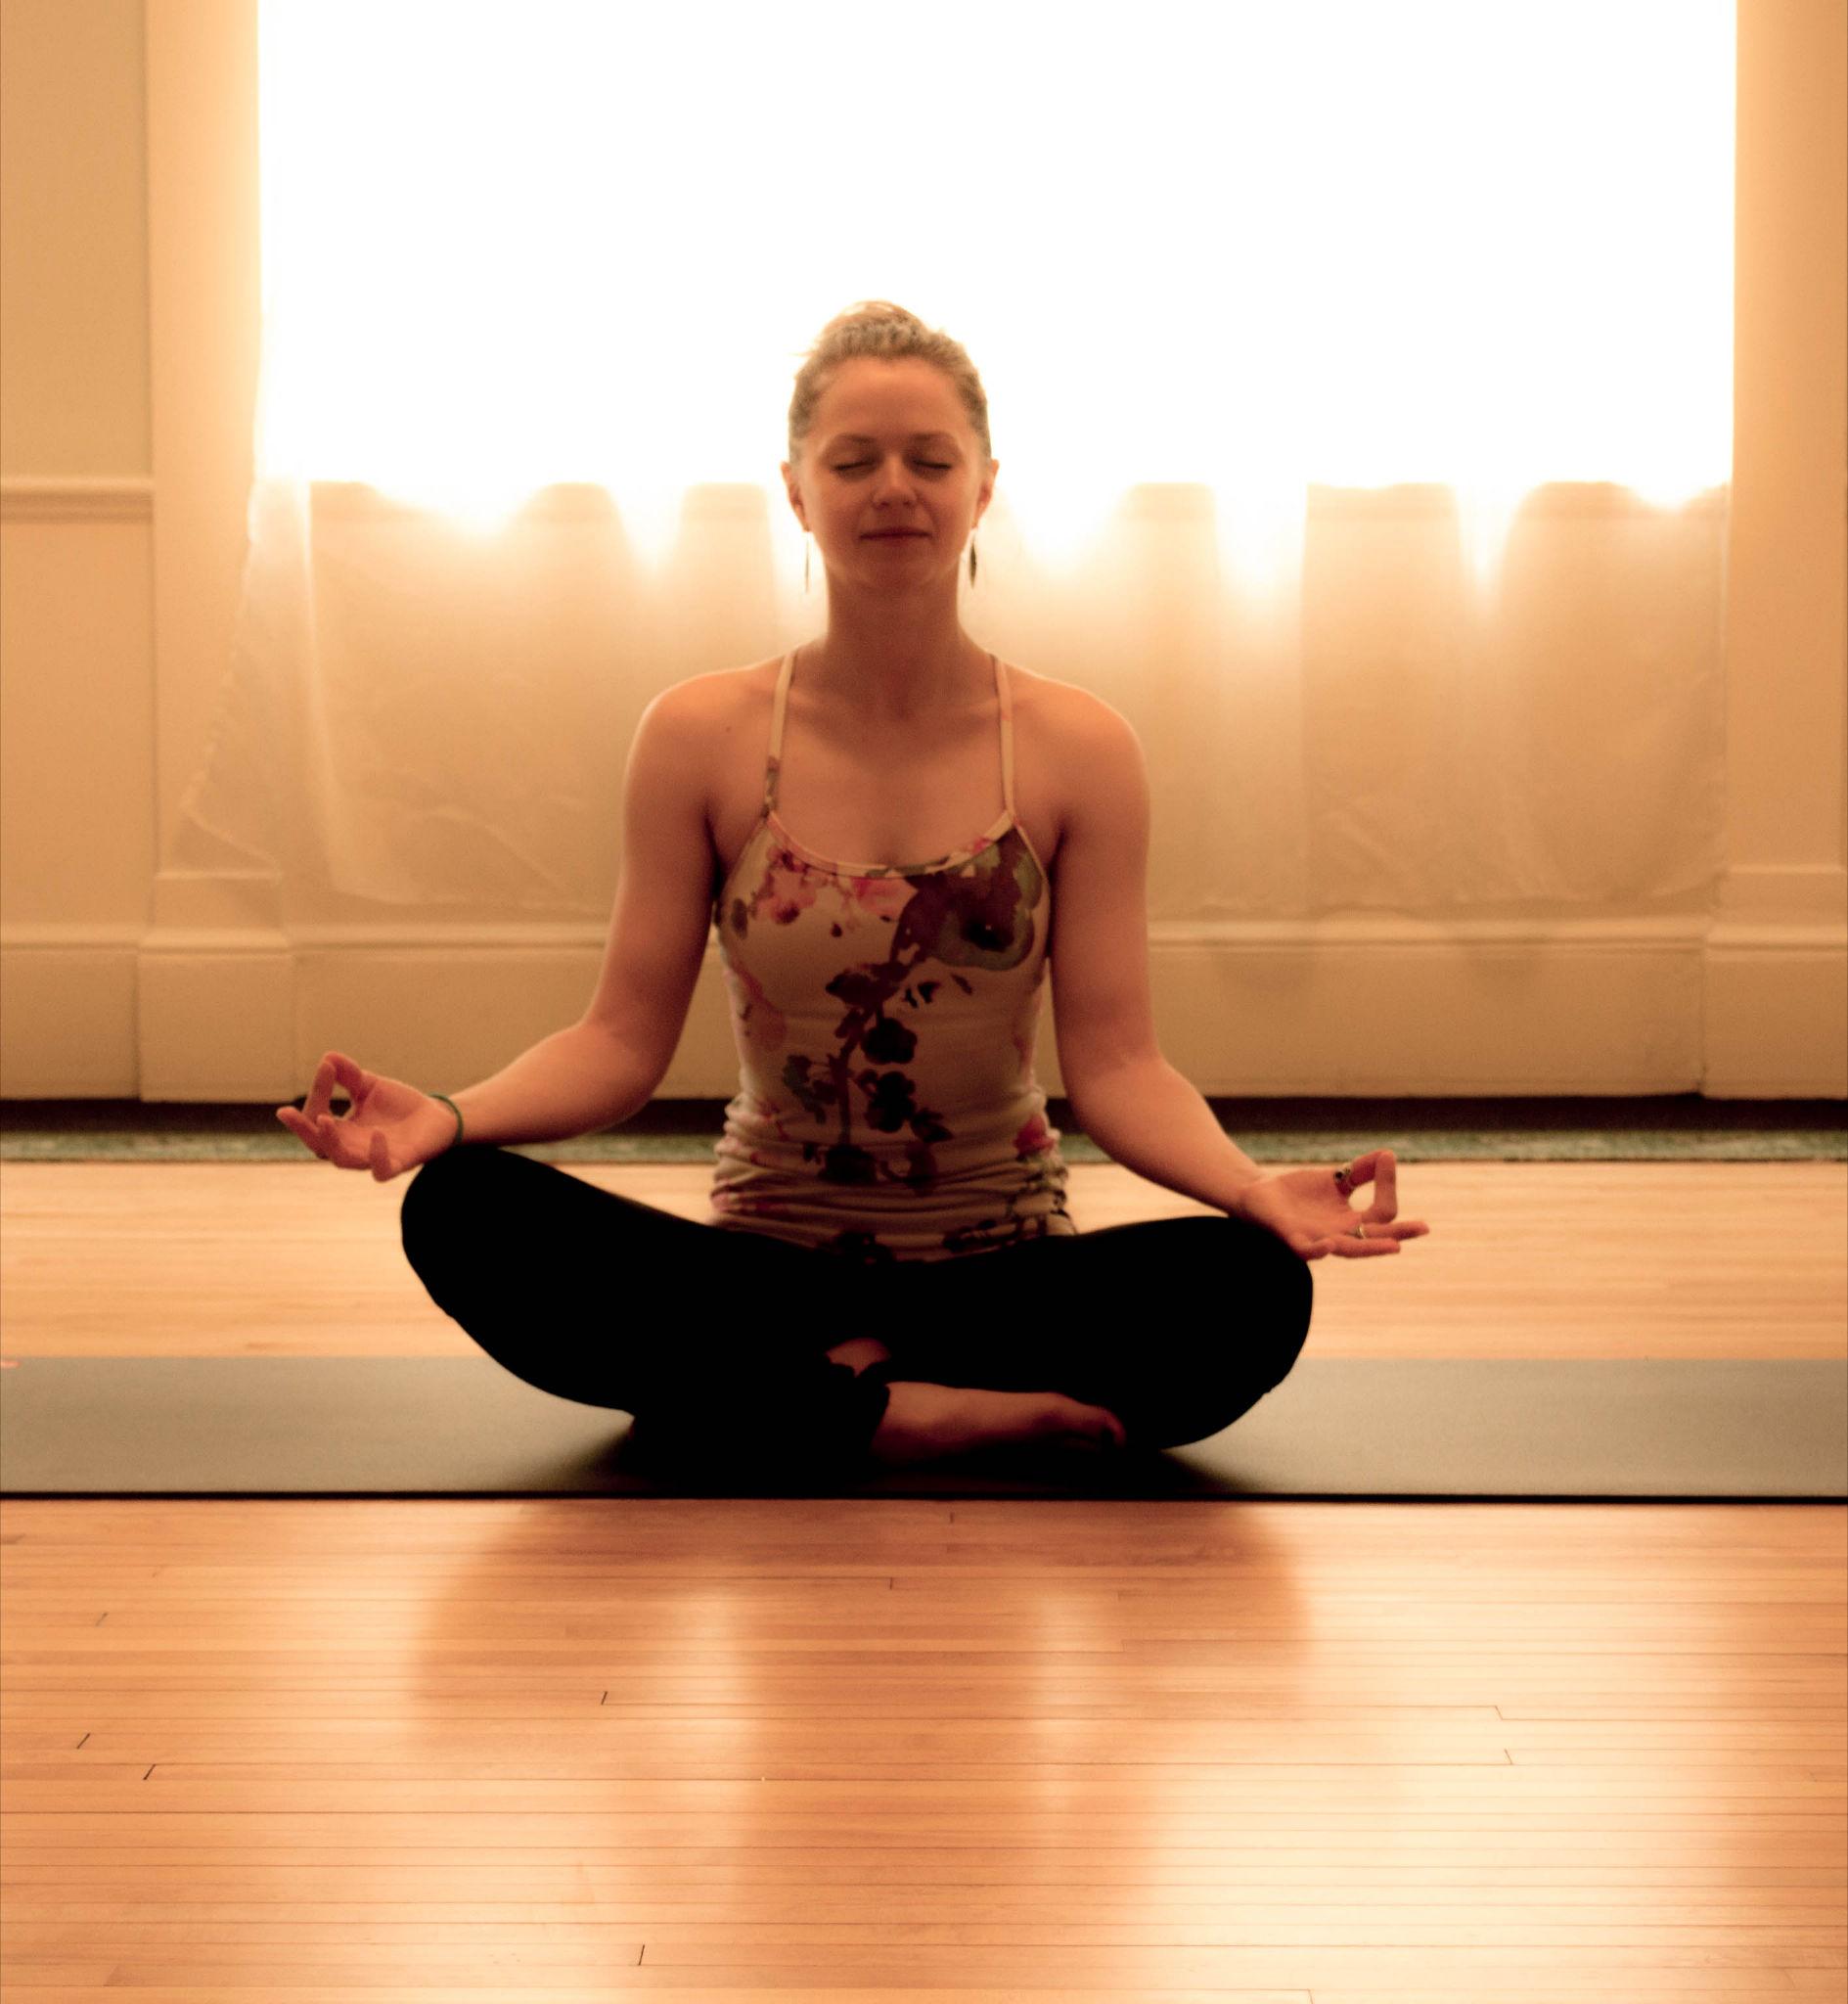 sitting yoga pose-0001.jpg